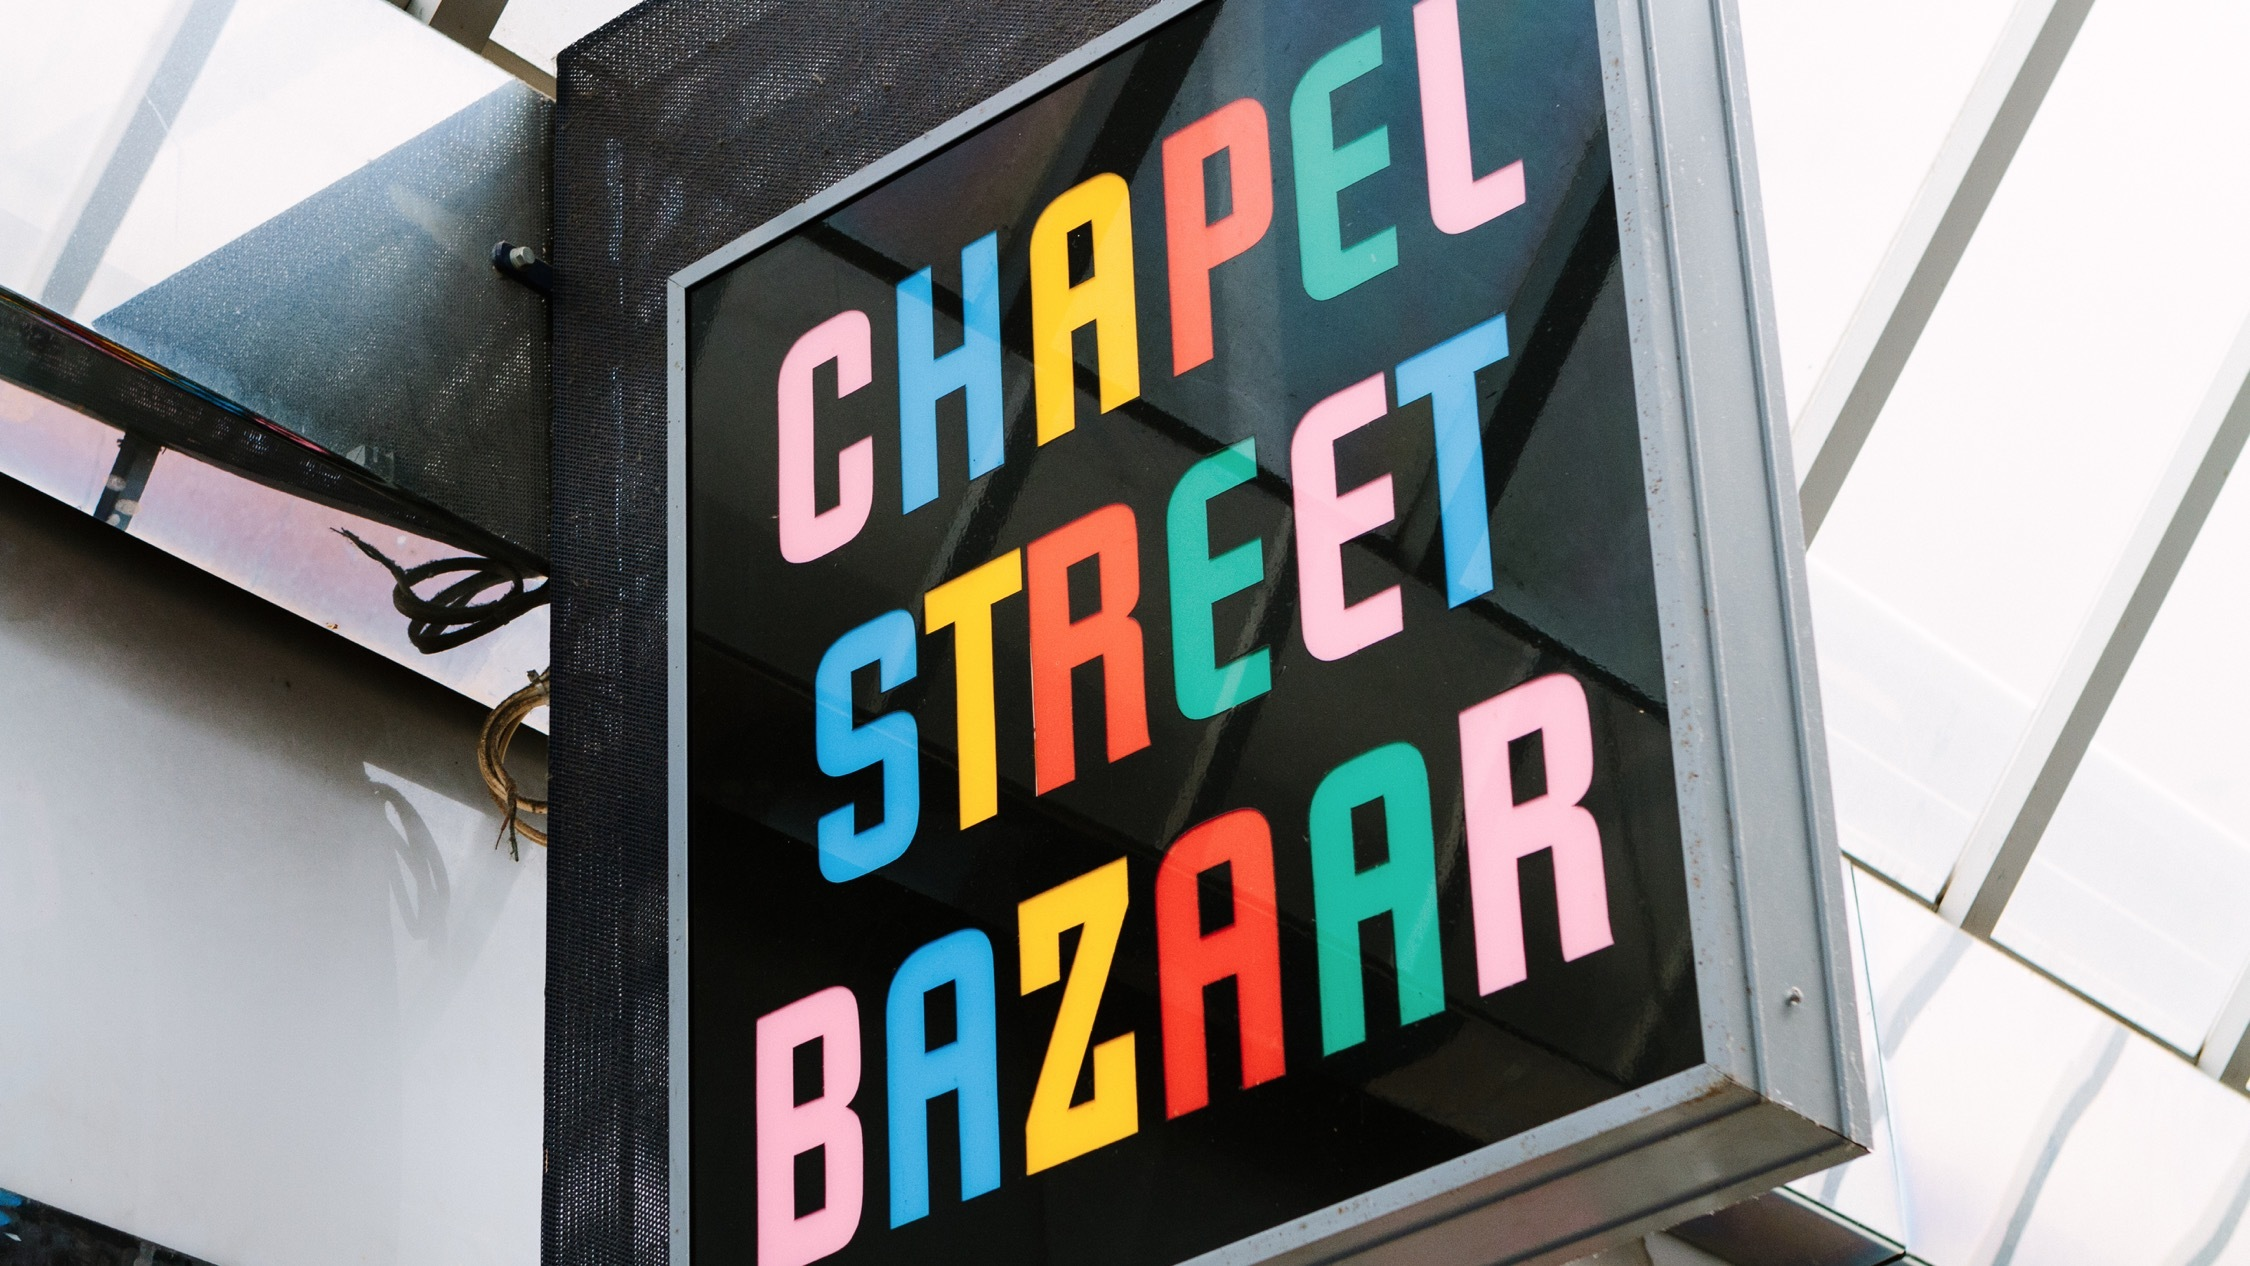 Sign at Chapel Street Bazaar